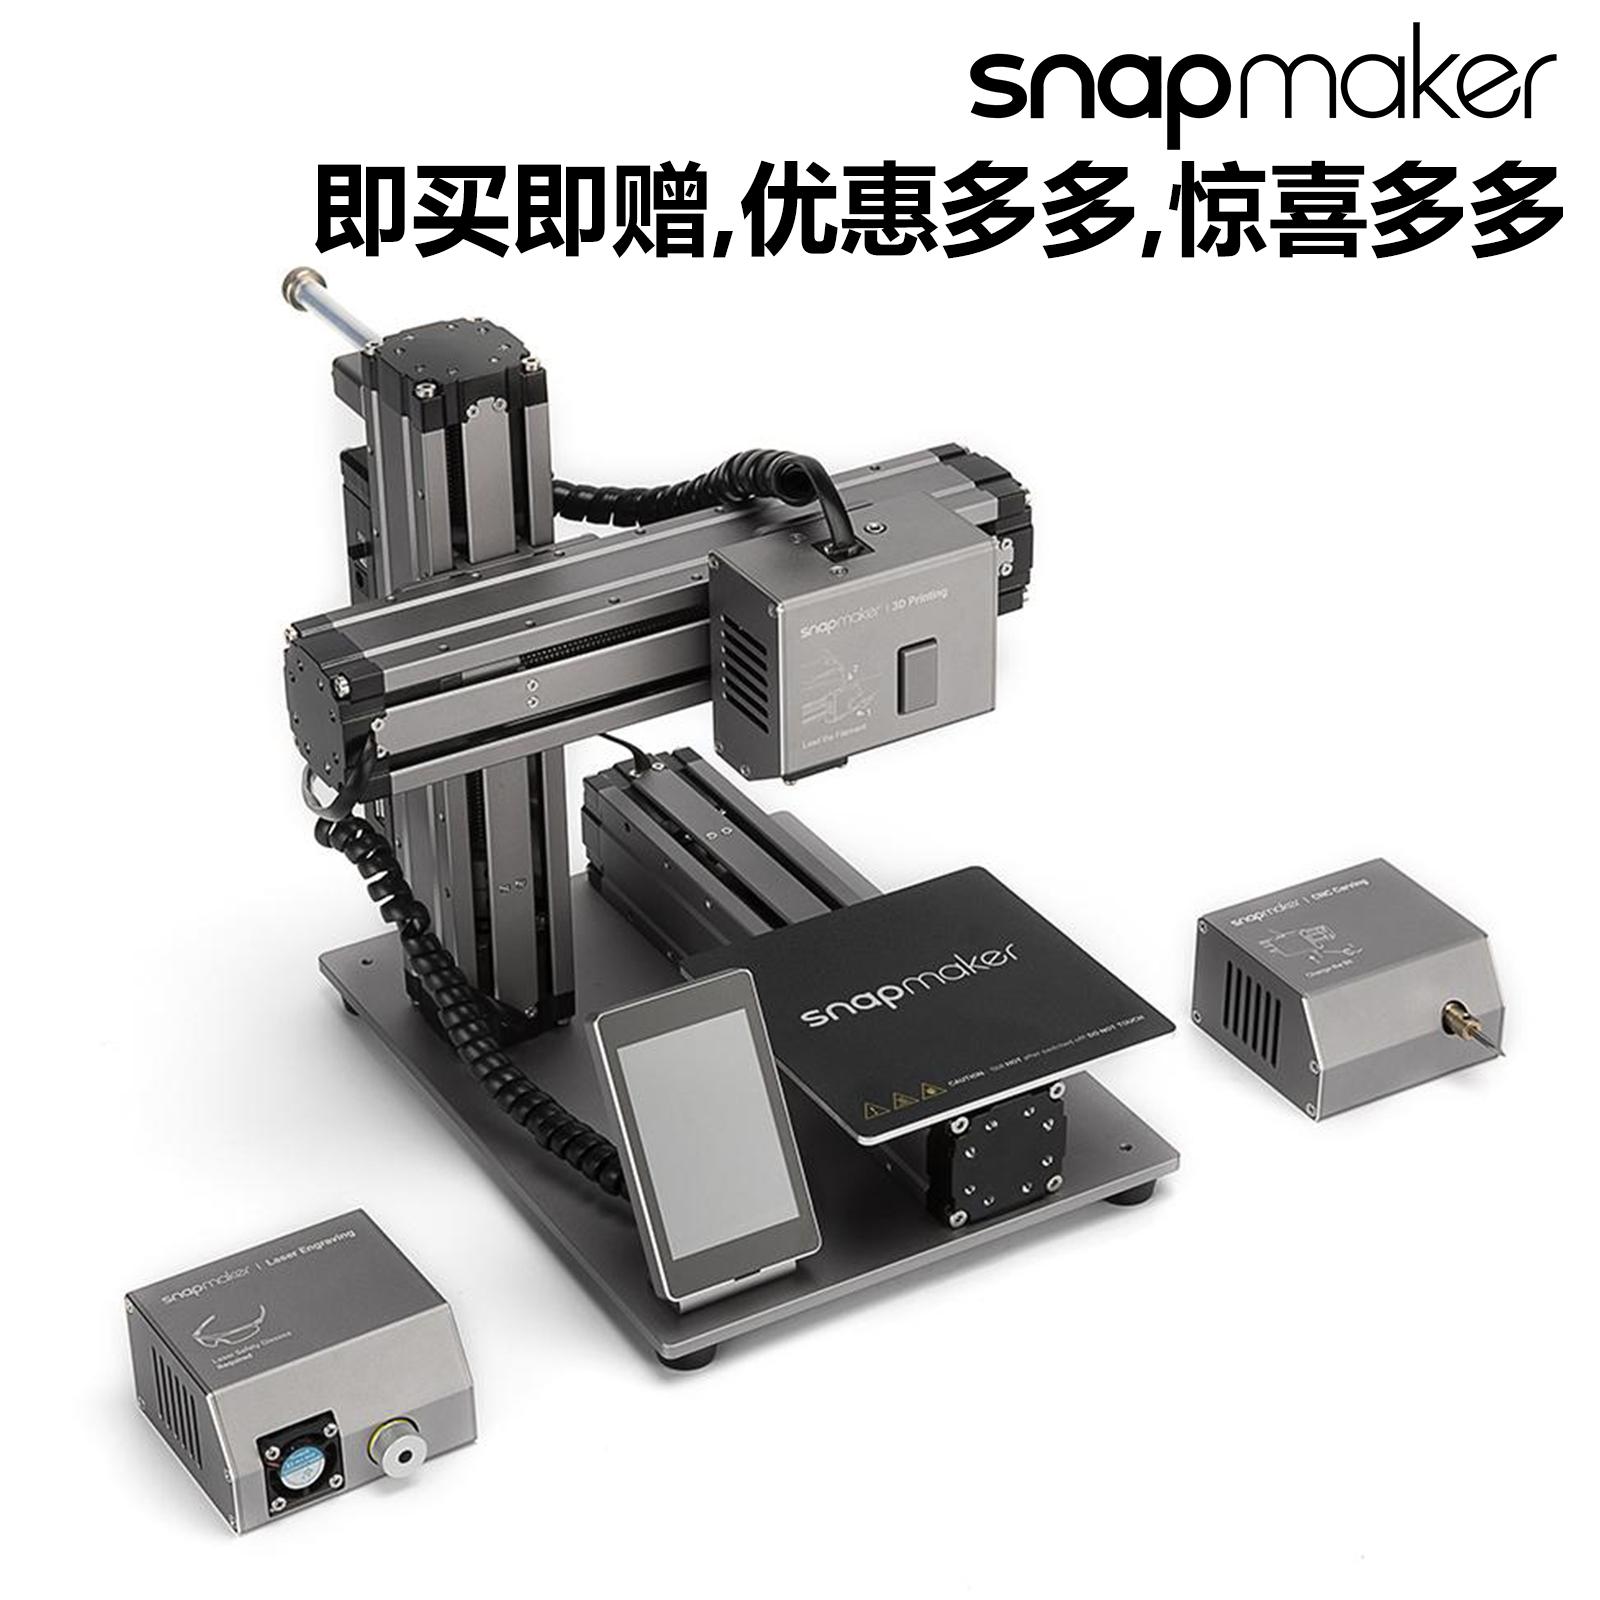 Snapmaker激光雕刻CNC切割三合一3D打印机桌面级高精度家用教育